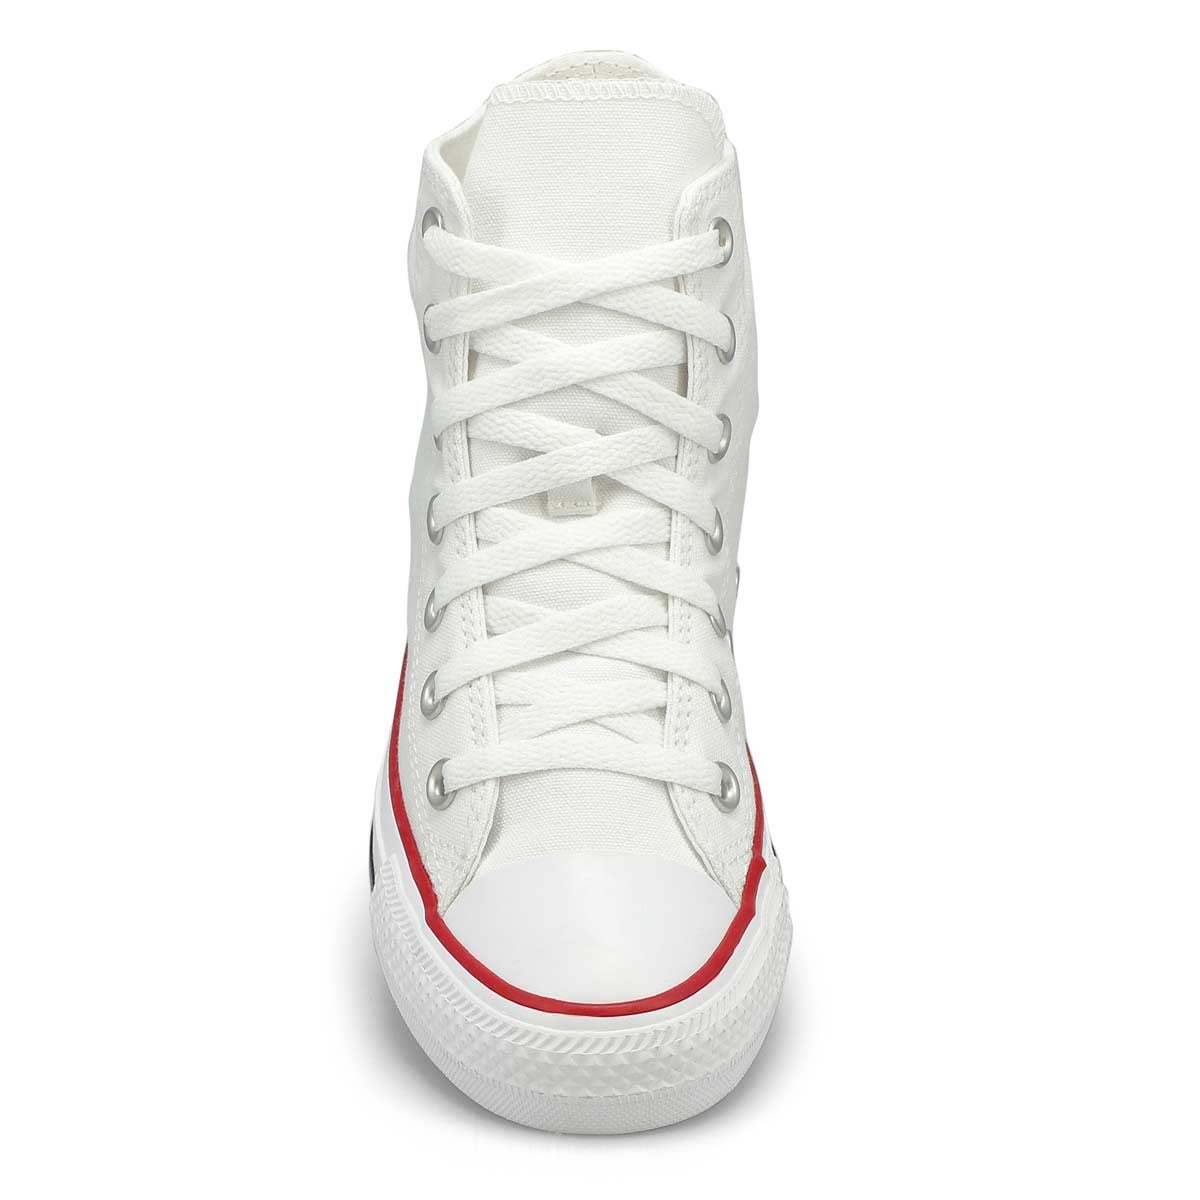 Women's Chuck Taylor All Star Hi Top Sneaker- Wht